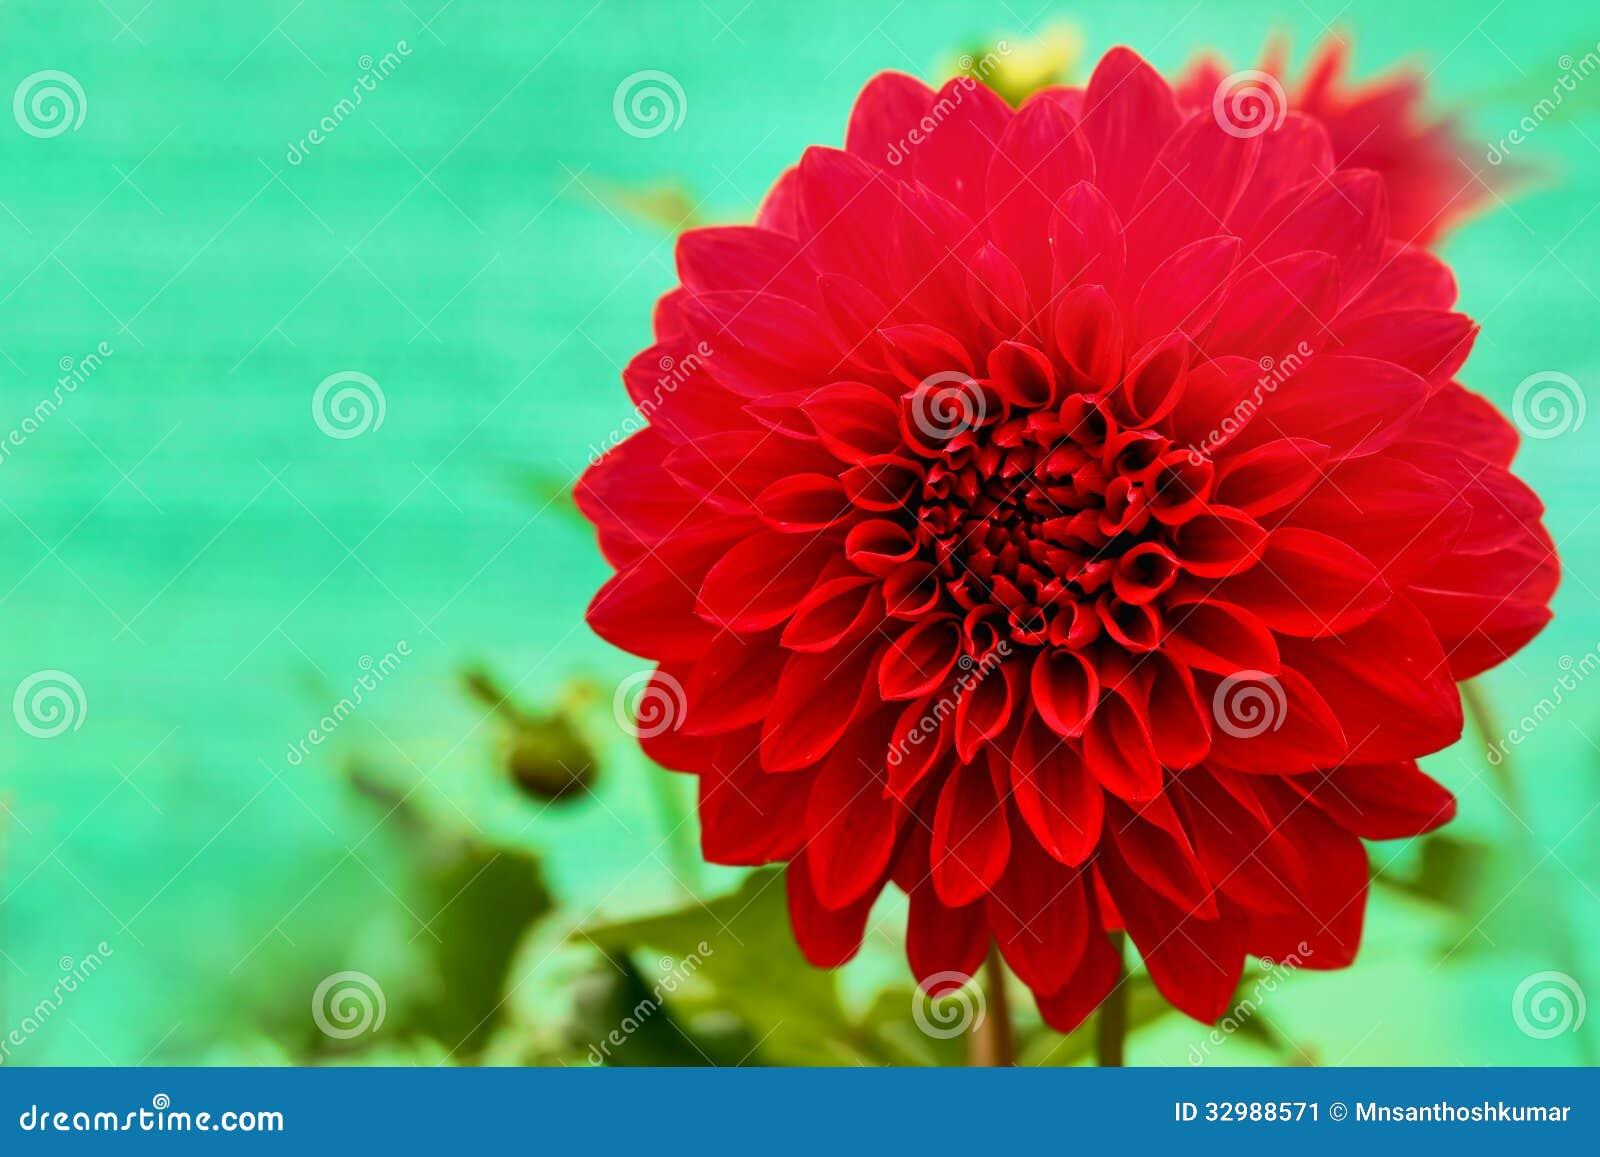 Dazzling red dahlia daisy flower with beautiful petals stock image dazzling red dahlia daisy flower with beautiful petals mightylinksfo